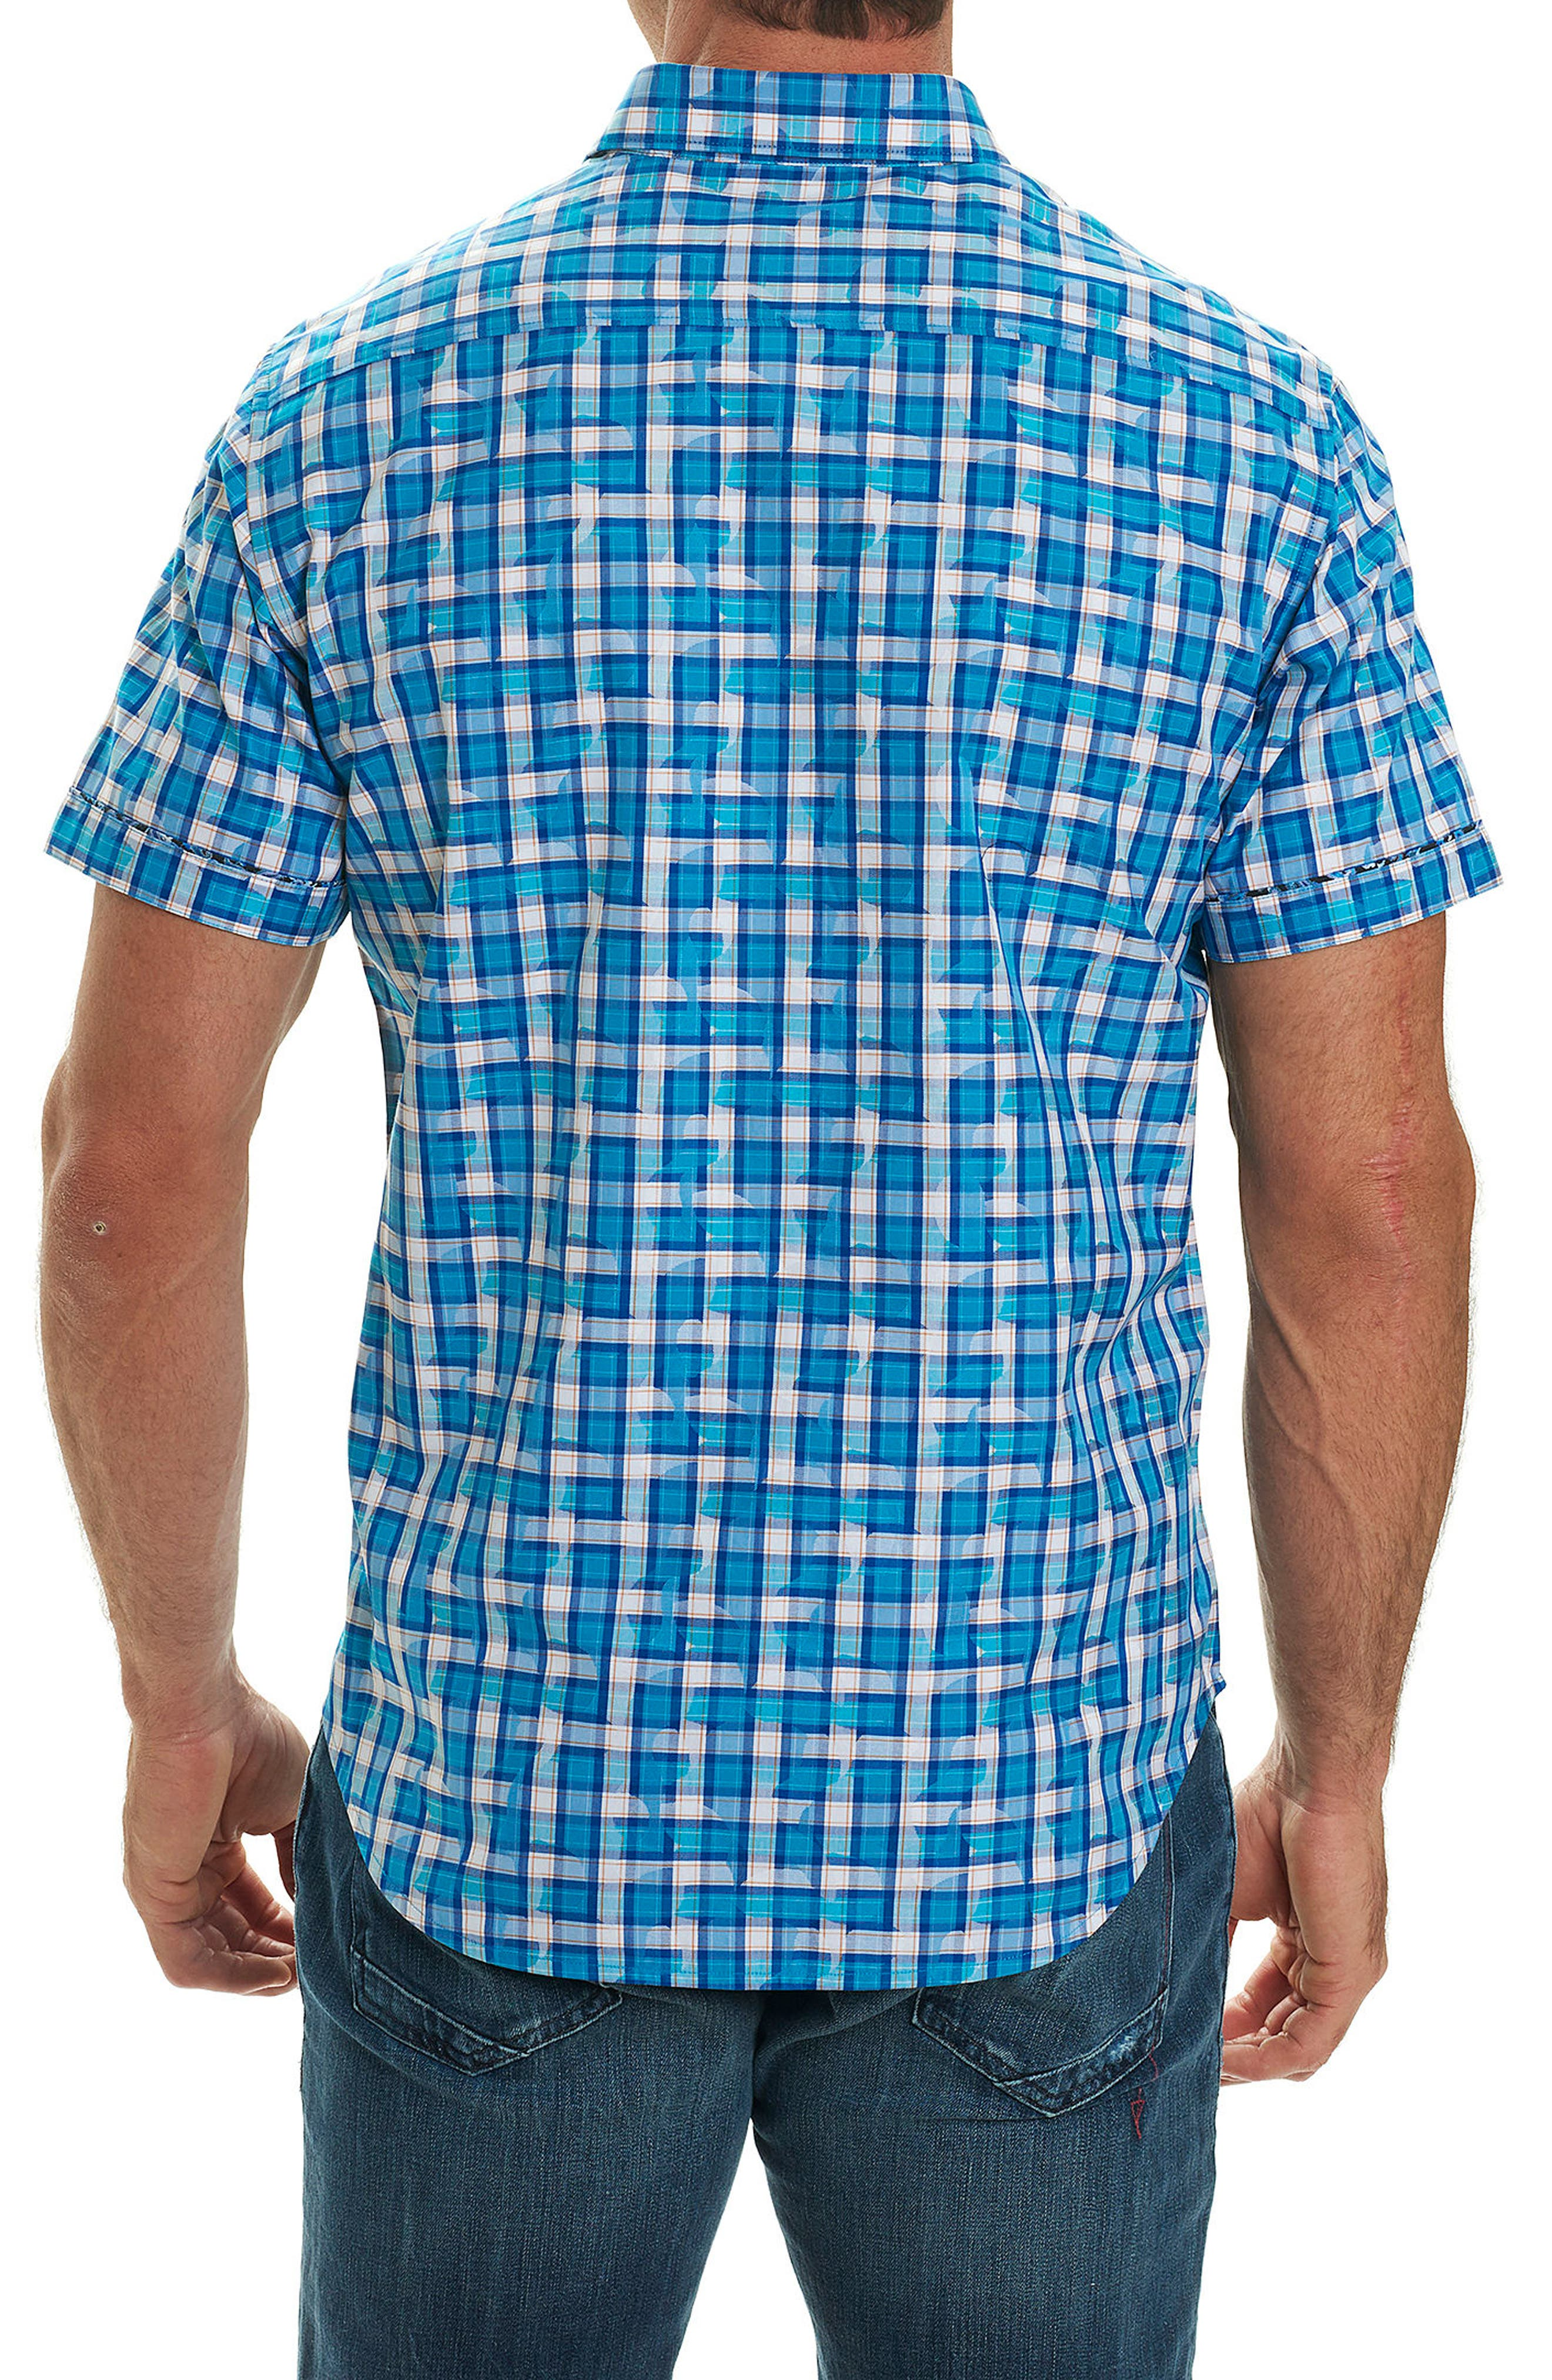 Tangier Classic Fit Print Sport Shirt,                             Alternate thumbnail 2, color,                             Teal